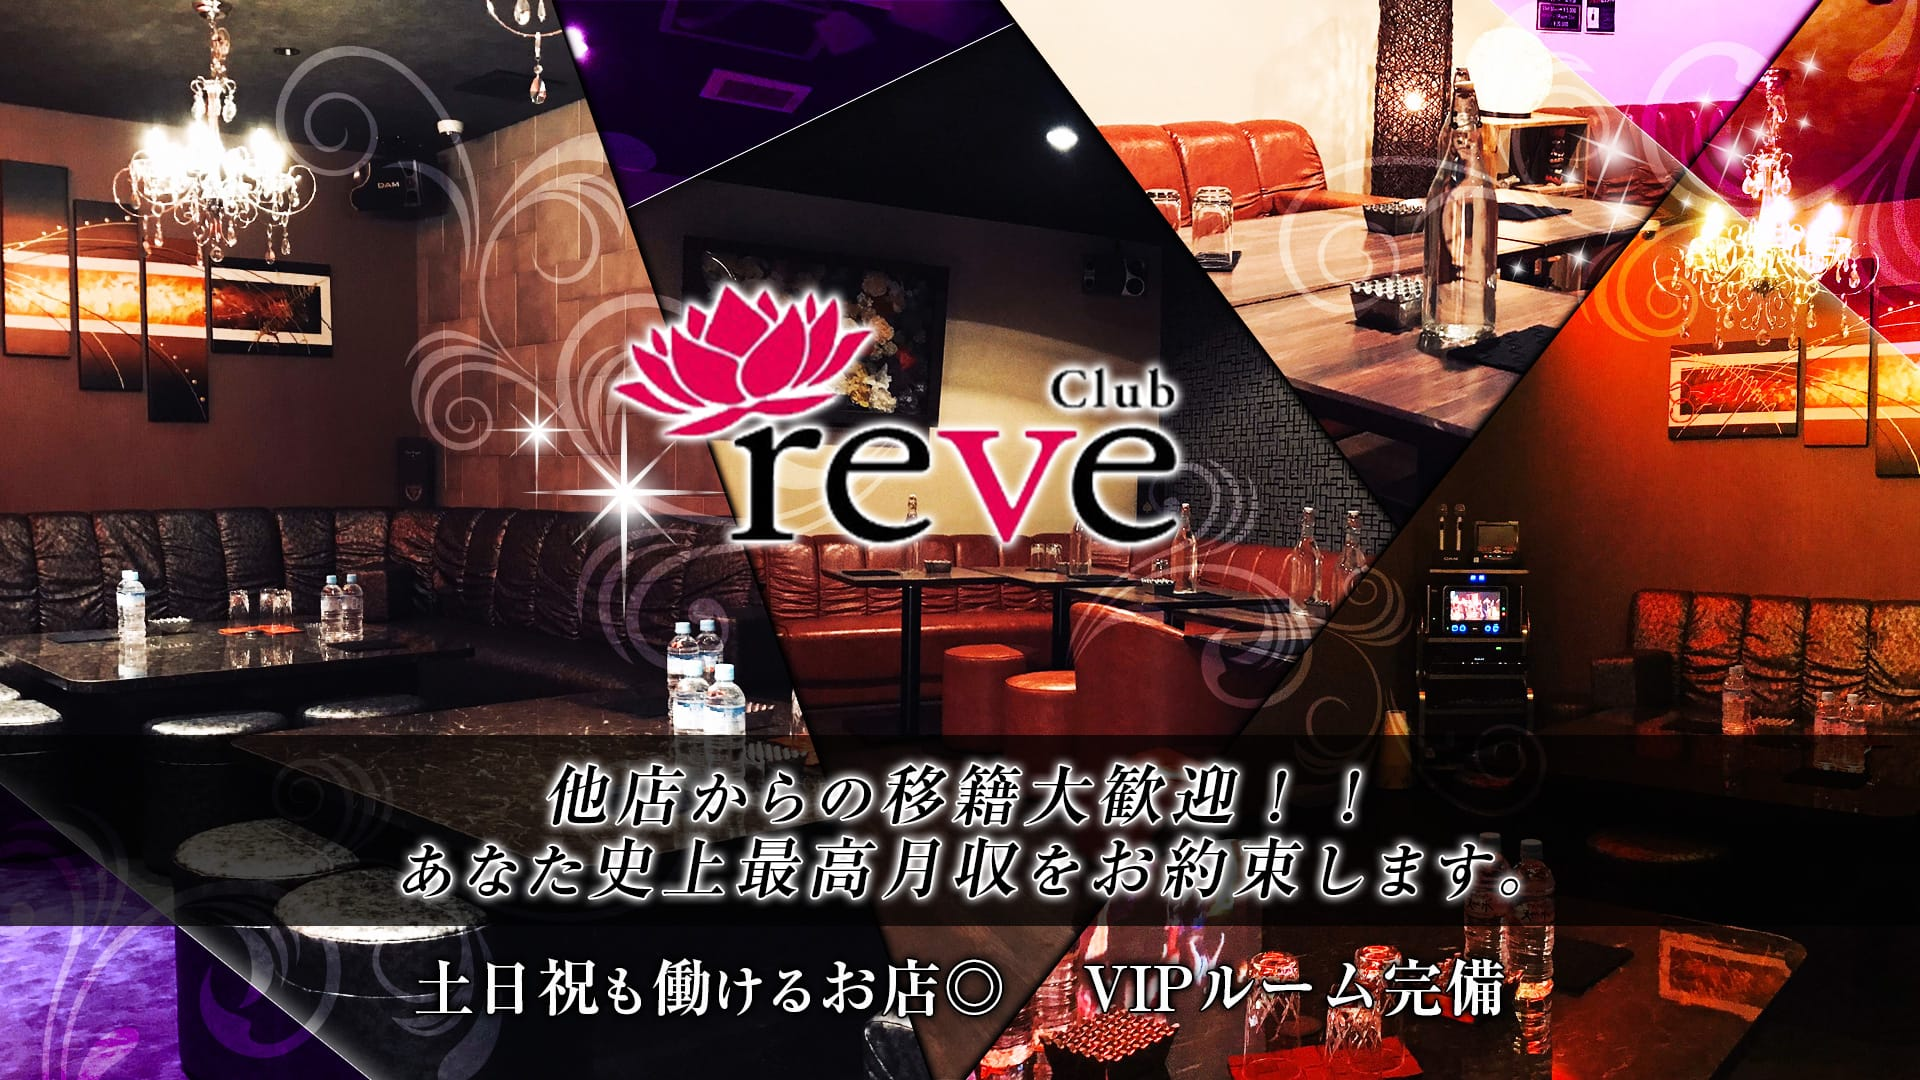 club reve(レーヴ) 五井キャバクラ TOP画像